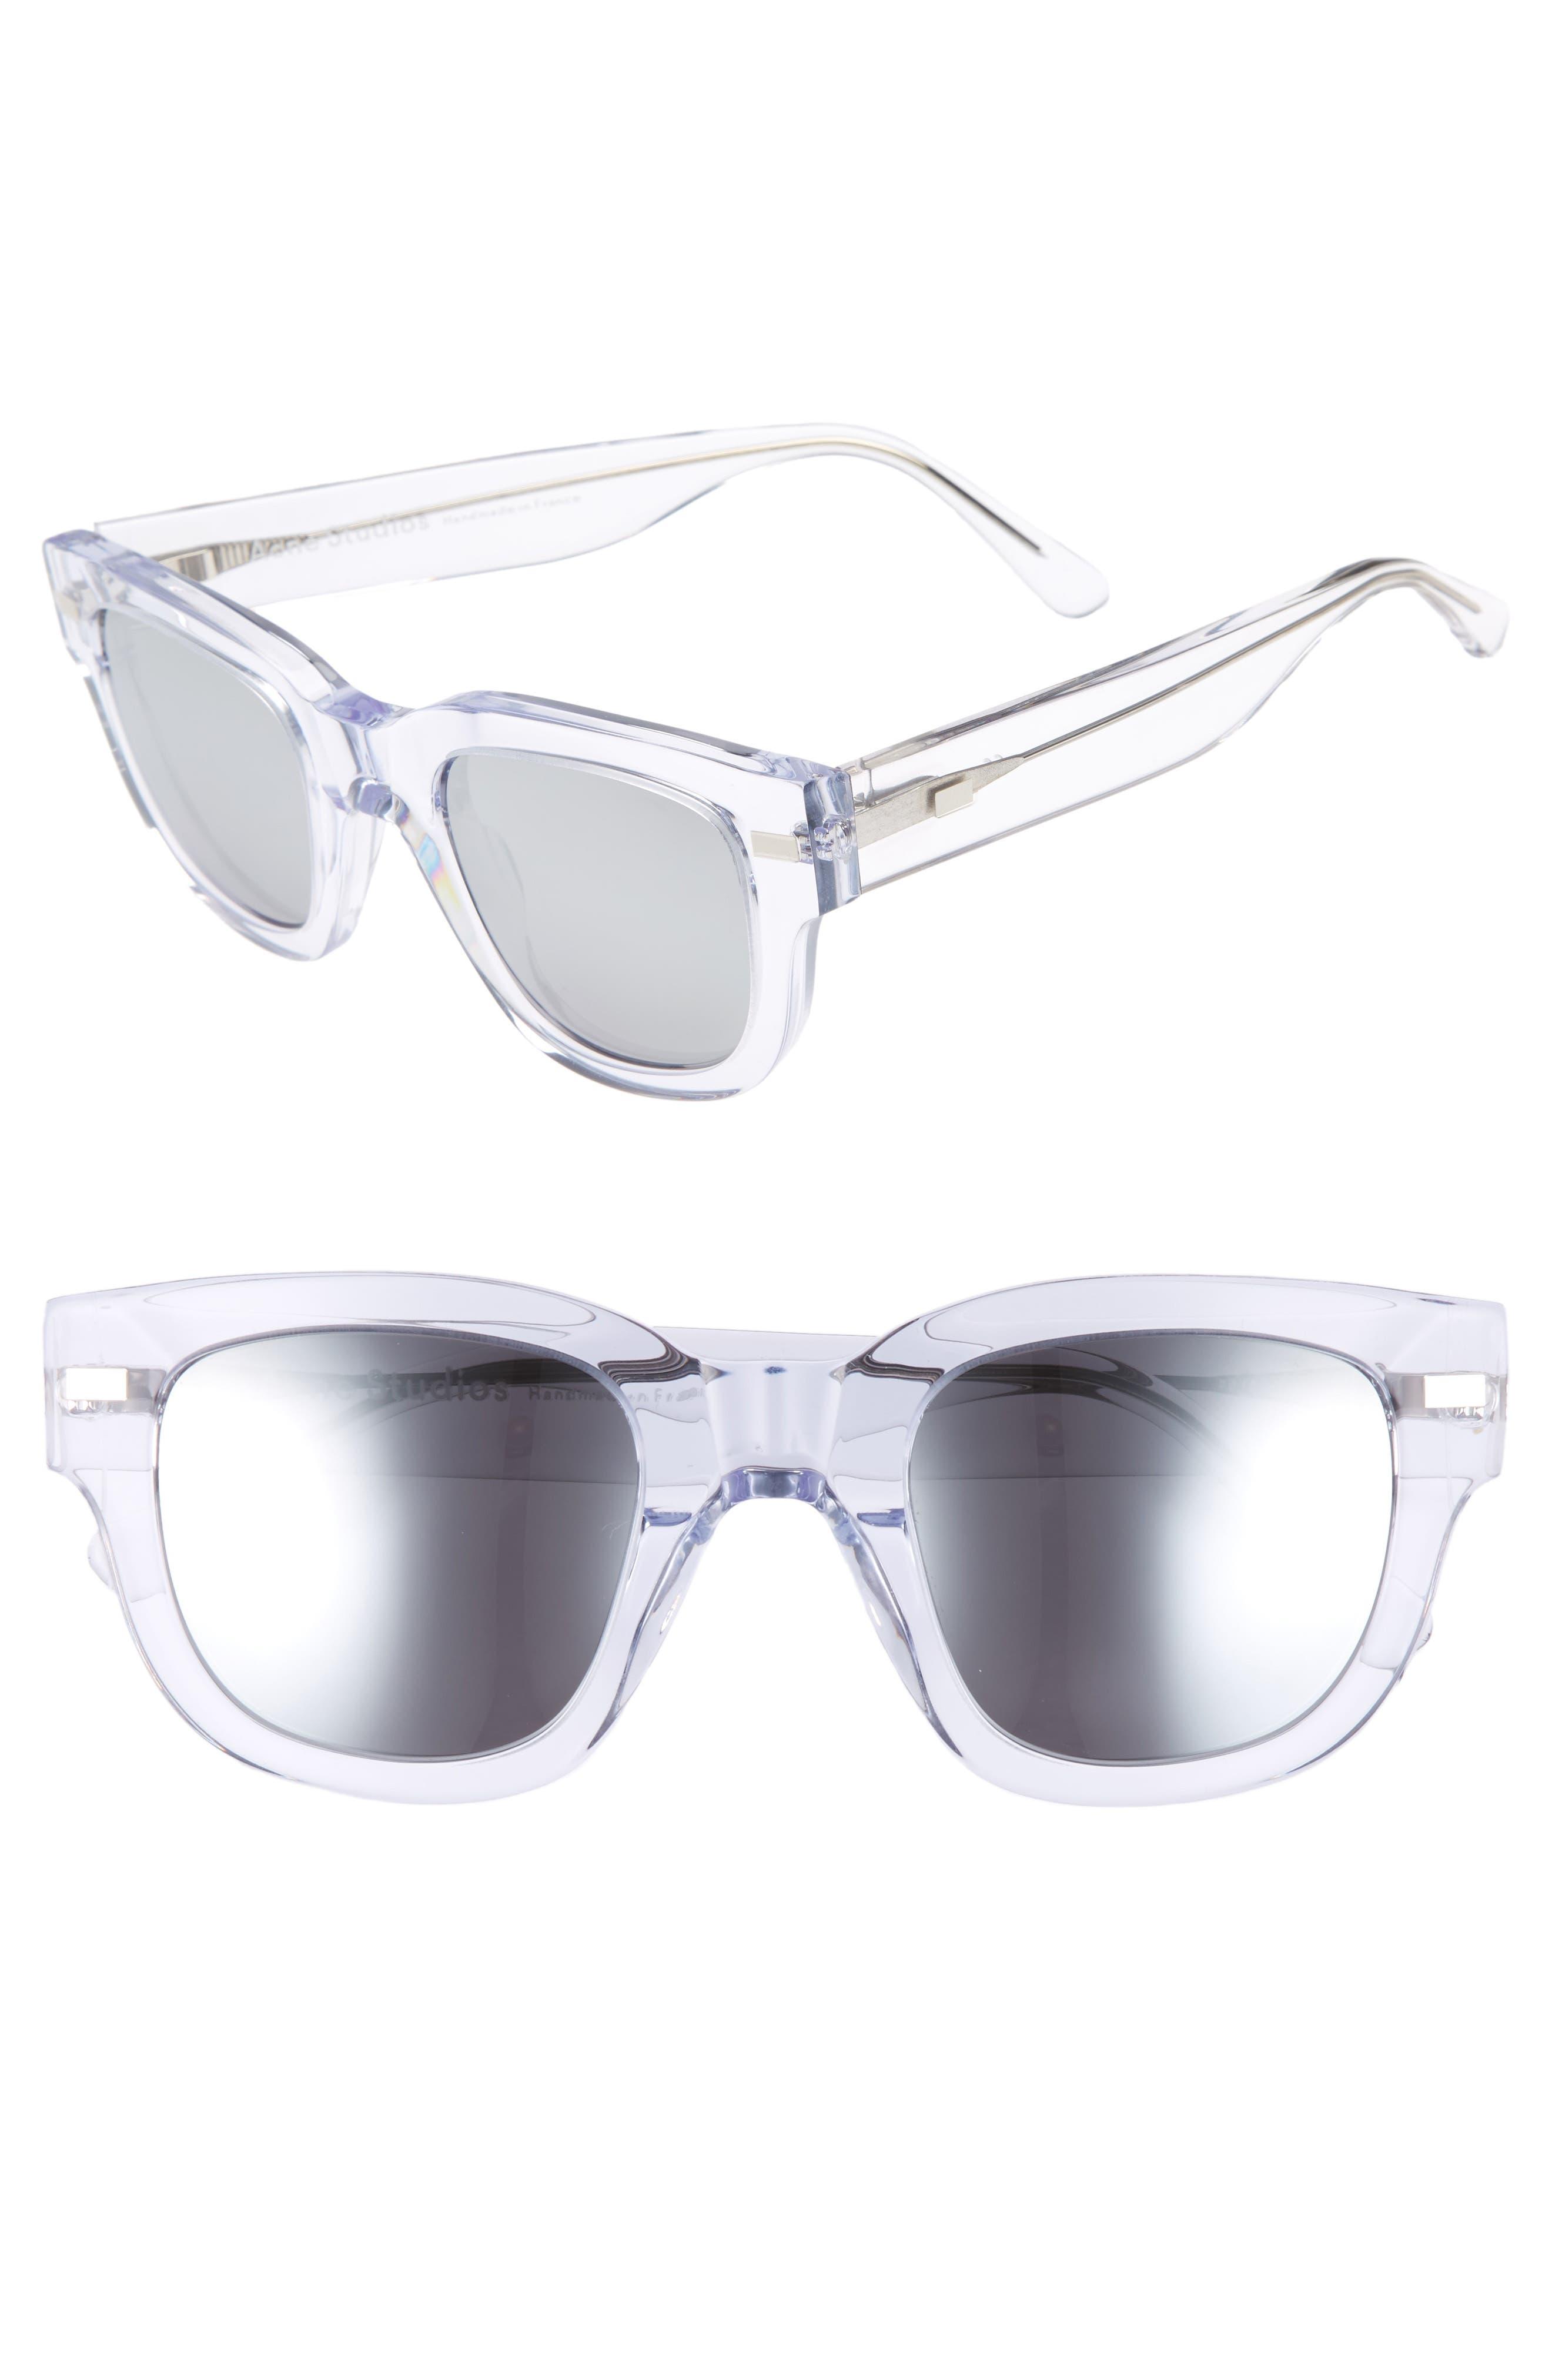 47mm Sunglasses,                             Main thumbnail 1, color,                             Clear/ Silver Mirror